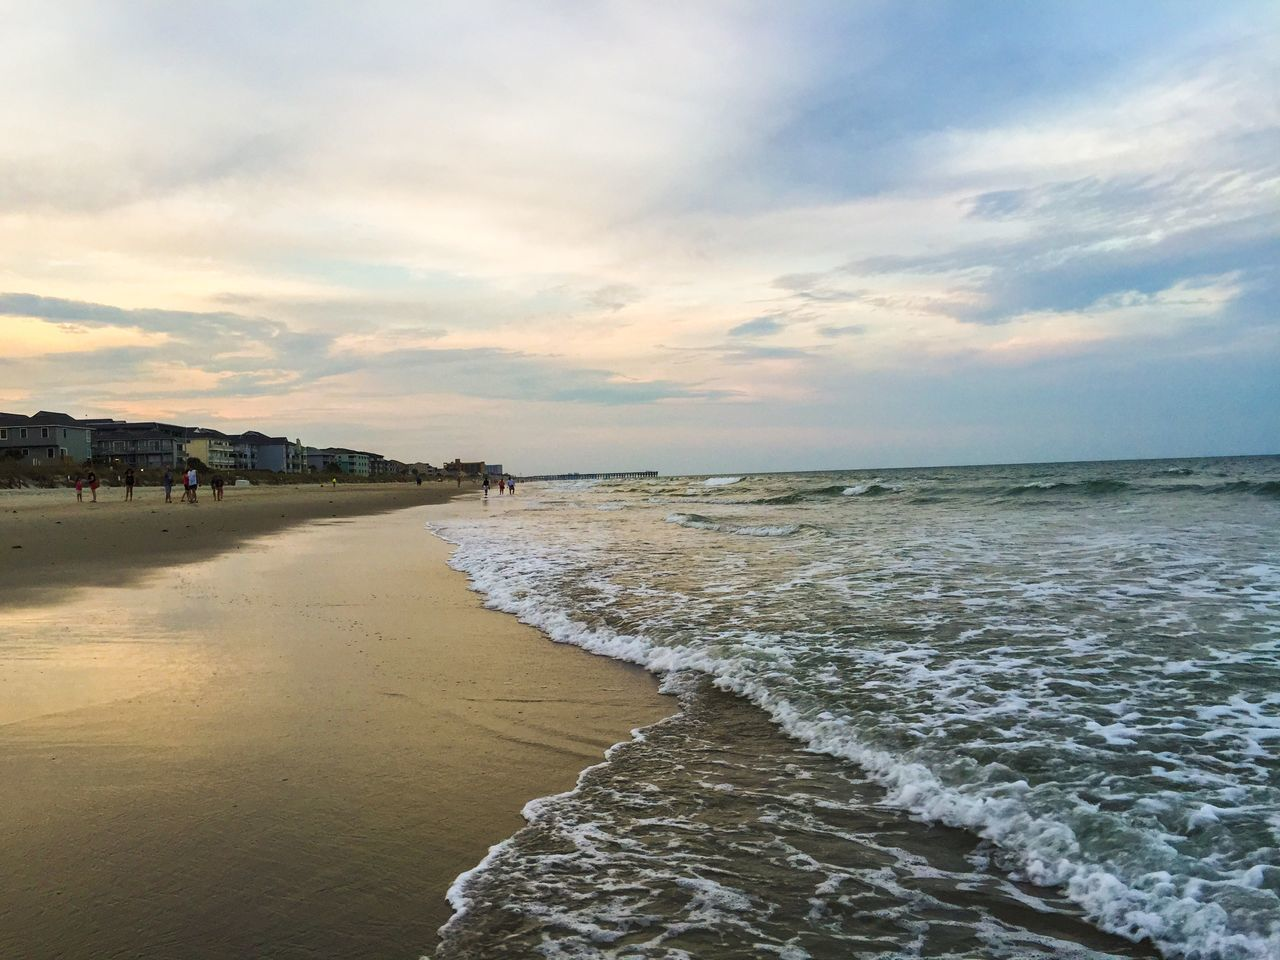 Watching the sea. Beach Foam Ocean Sand